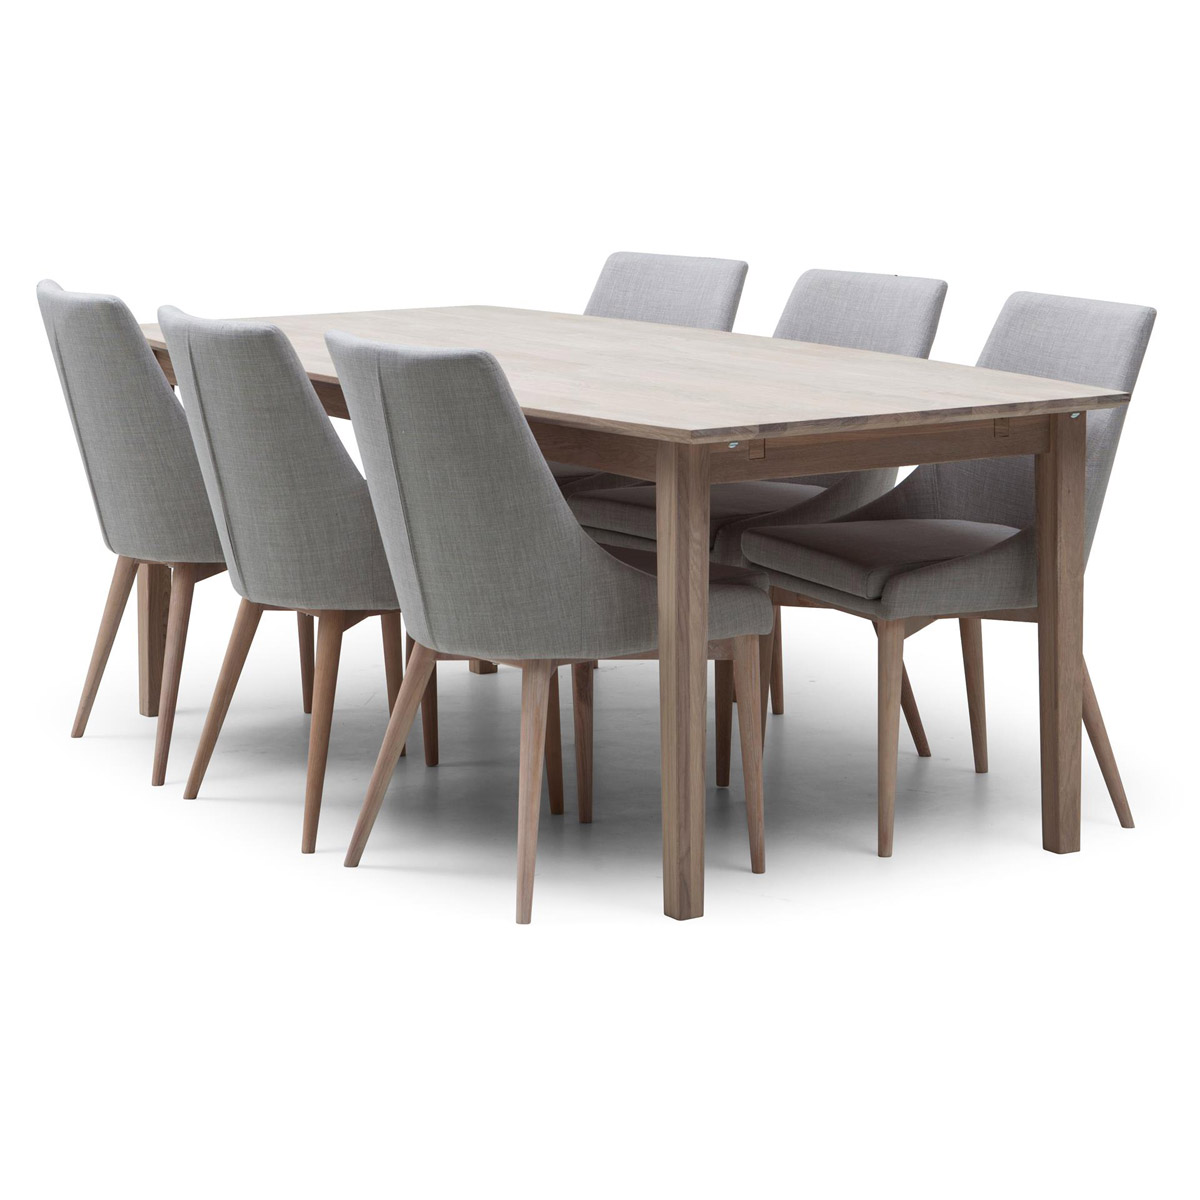 London-bord-200-6-stolar-vitoljad-ek-möbelmästarna